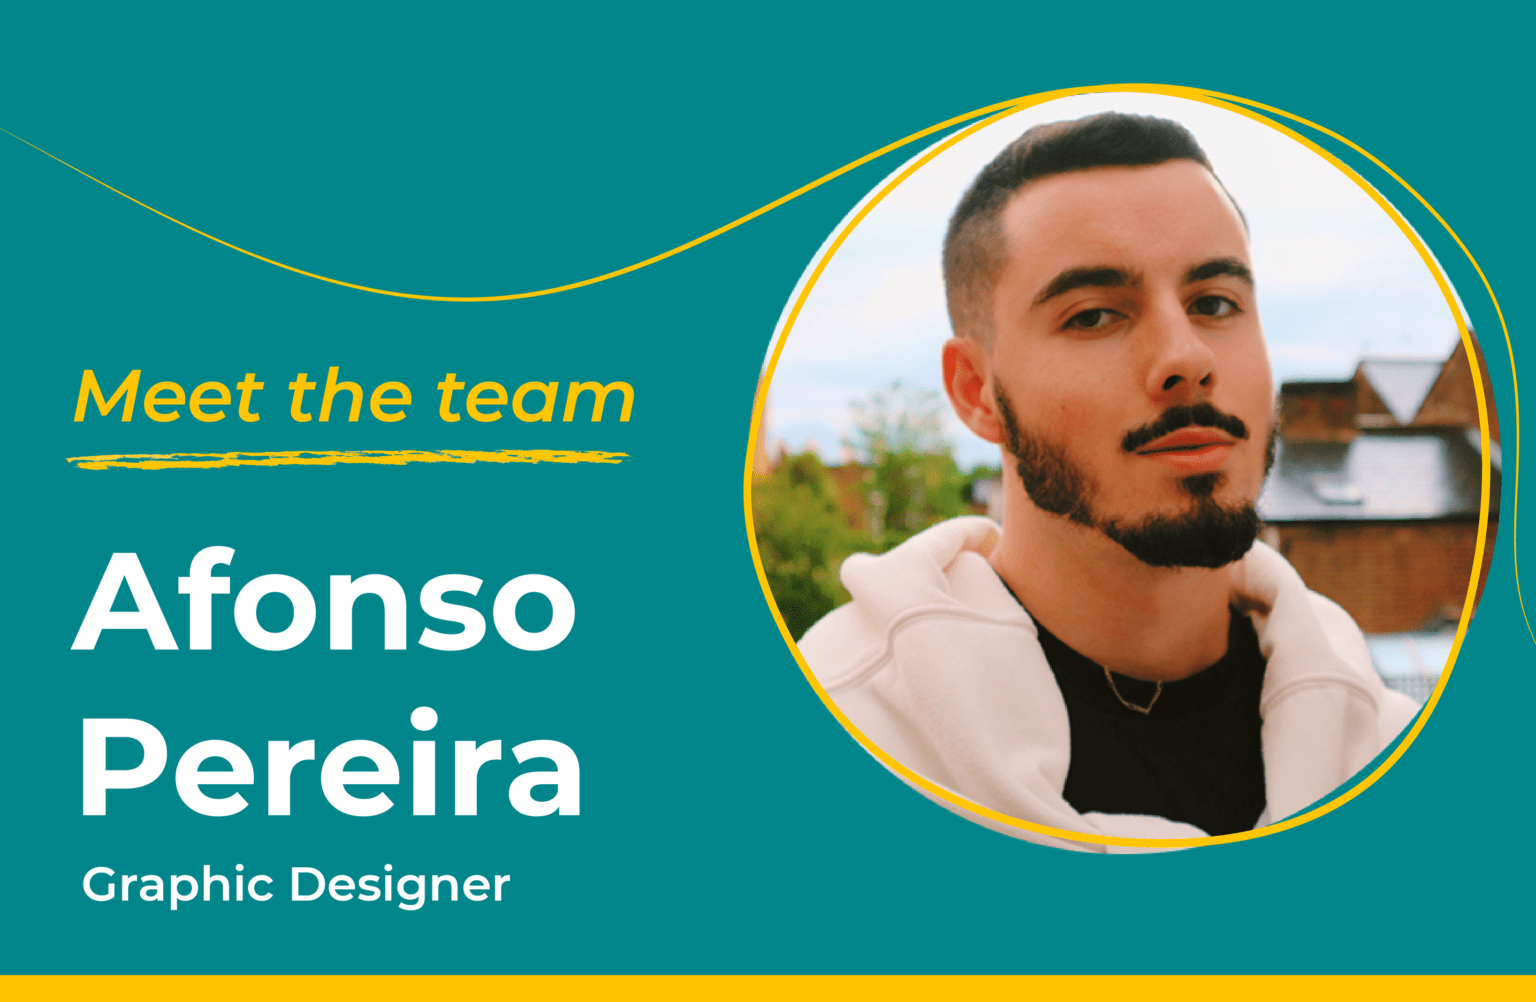 Meet the Team: Afonso Pereira   The Portfolio Collective